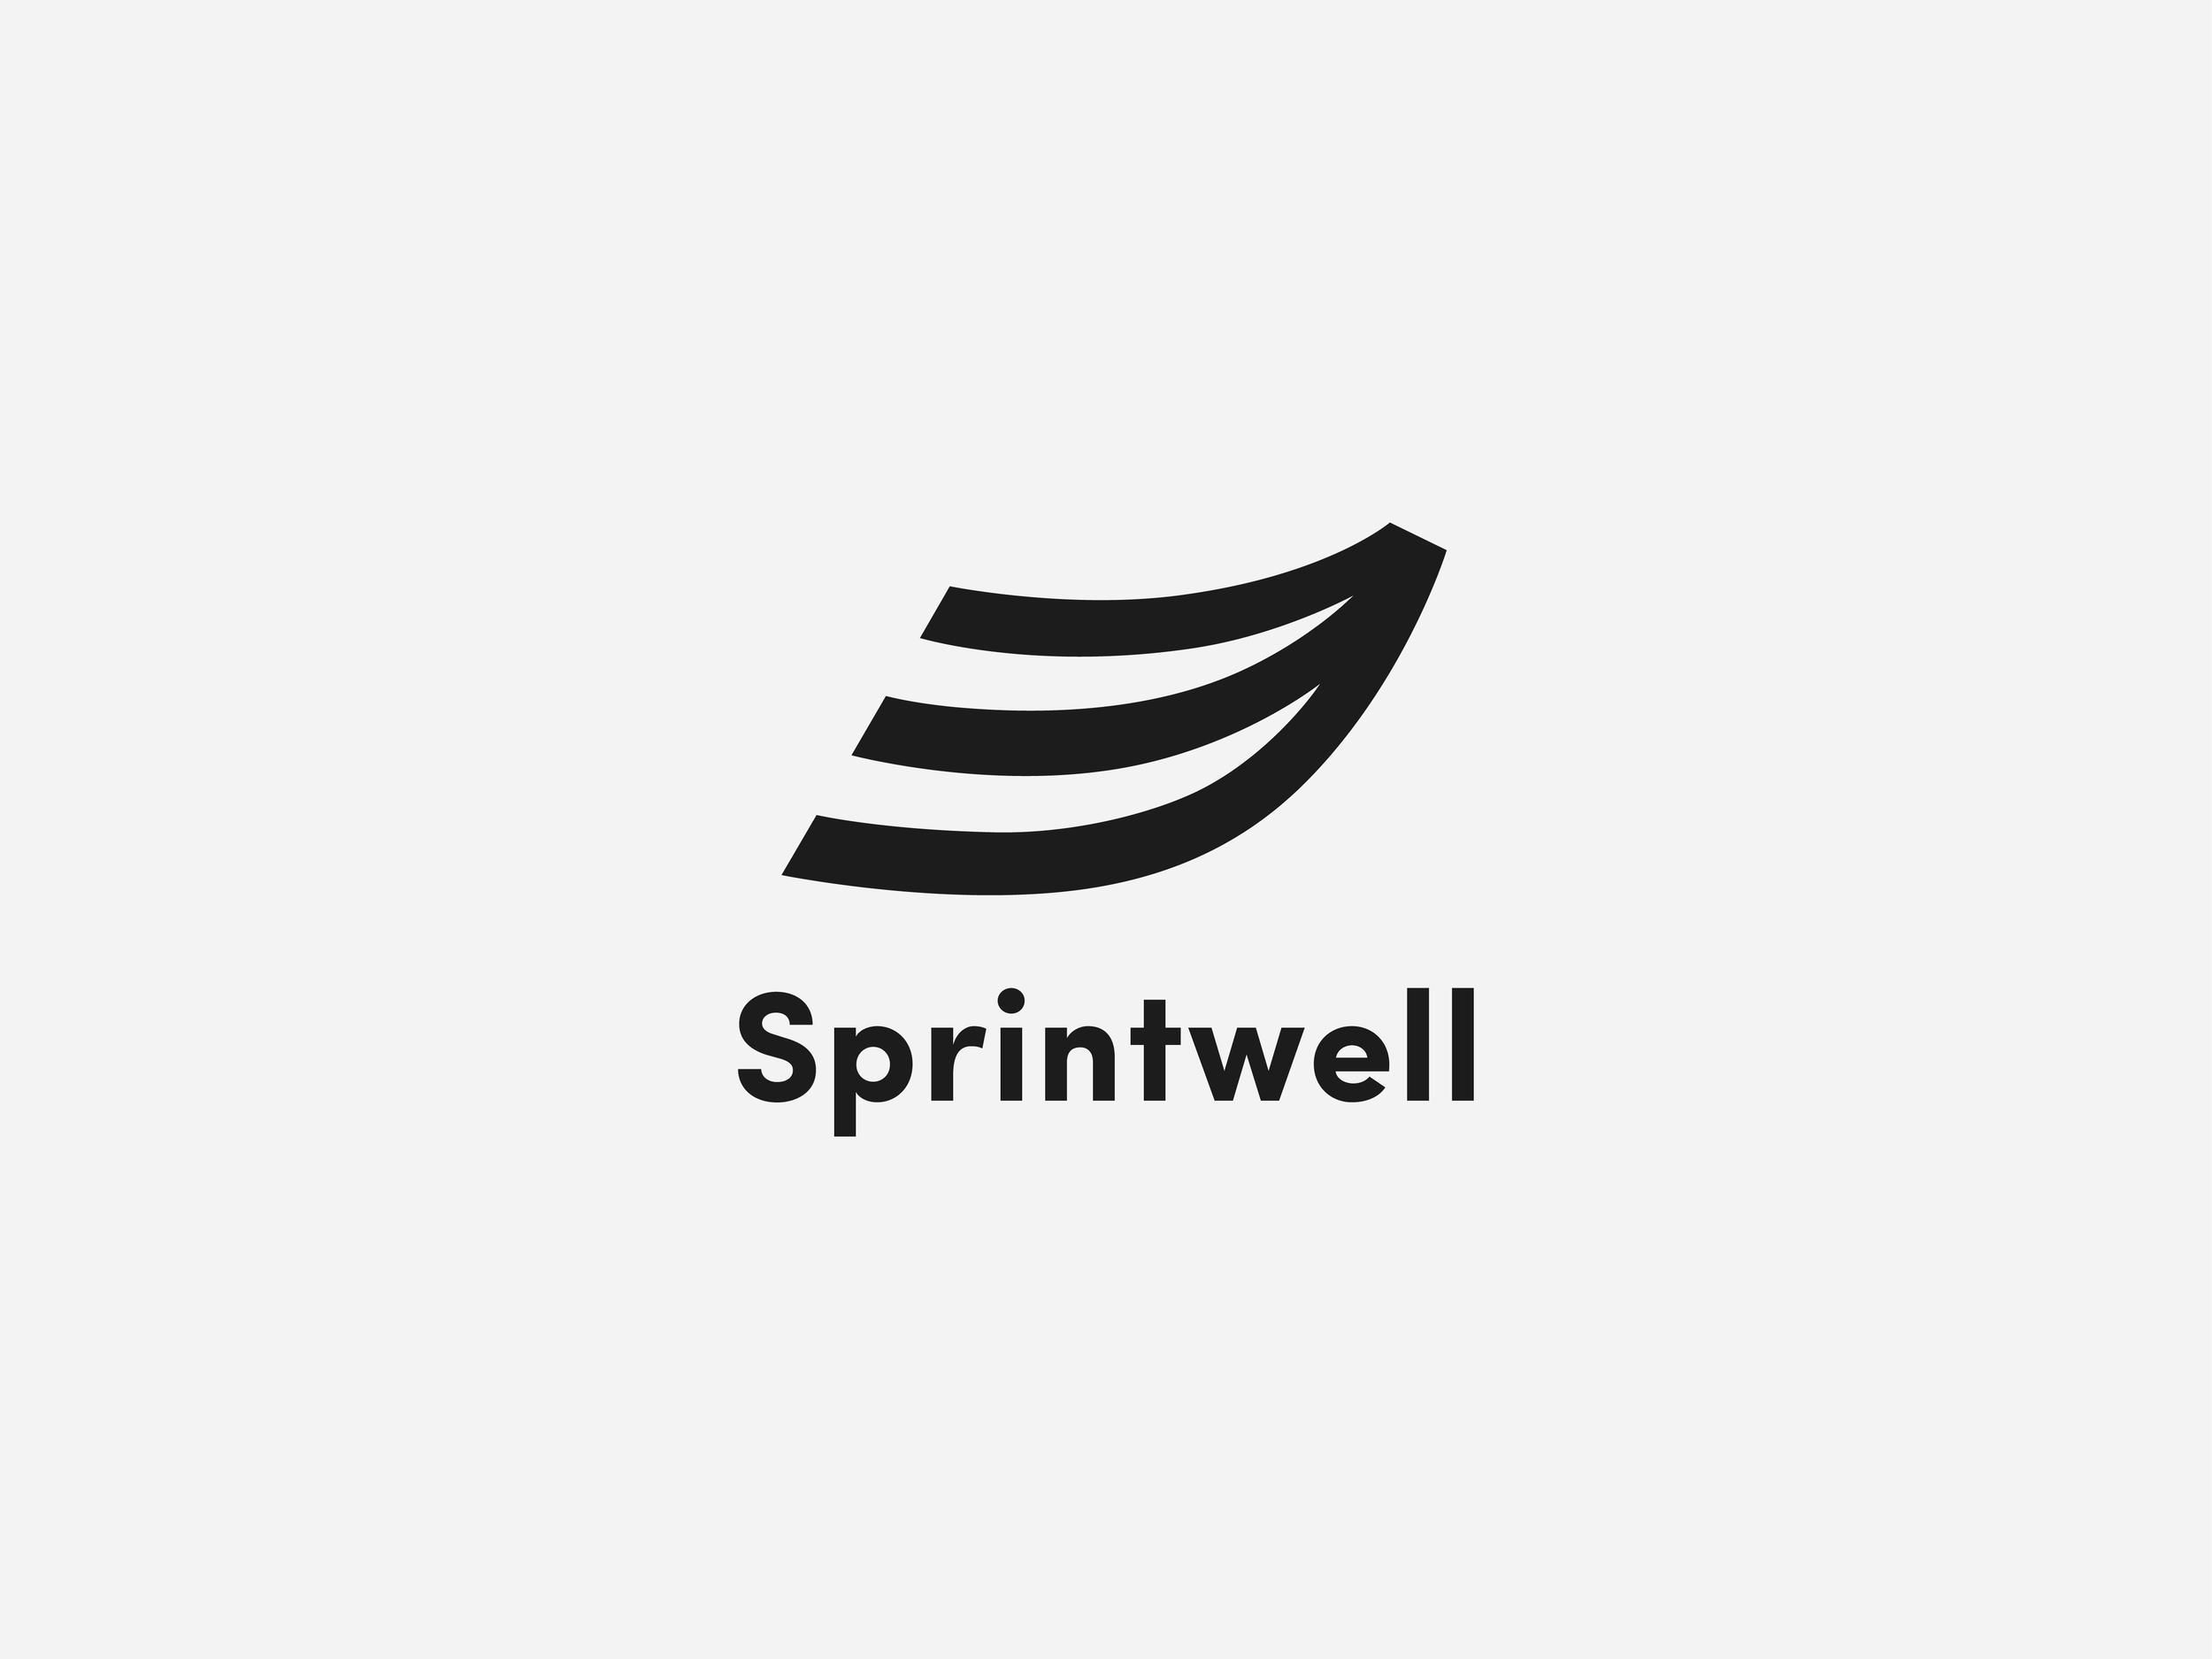 Sprintwell-LogoExplorations-02.png